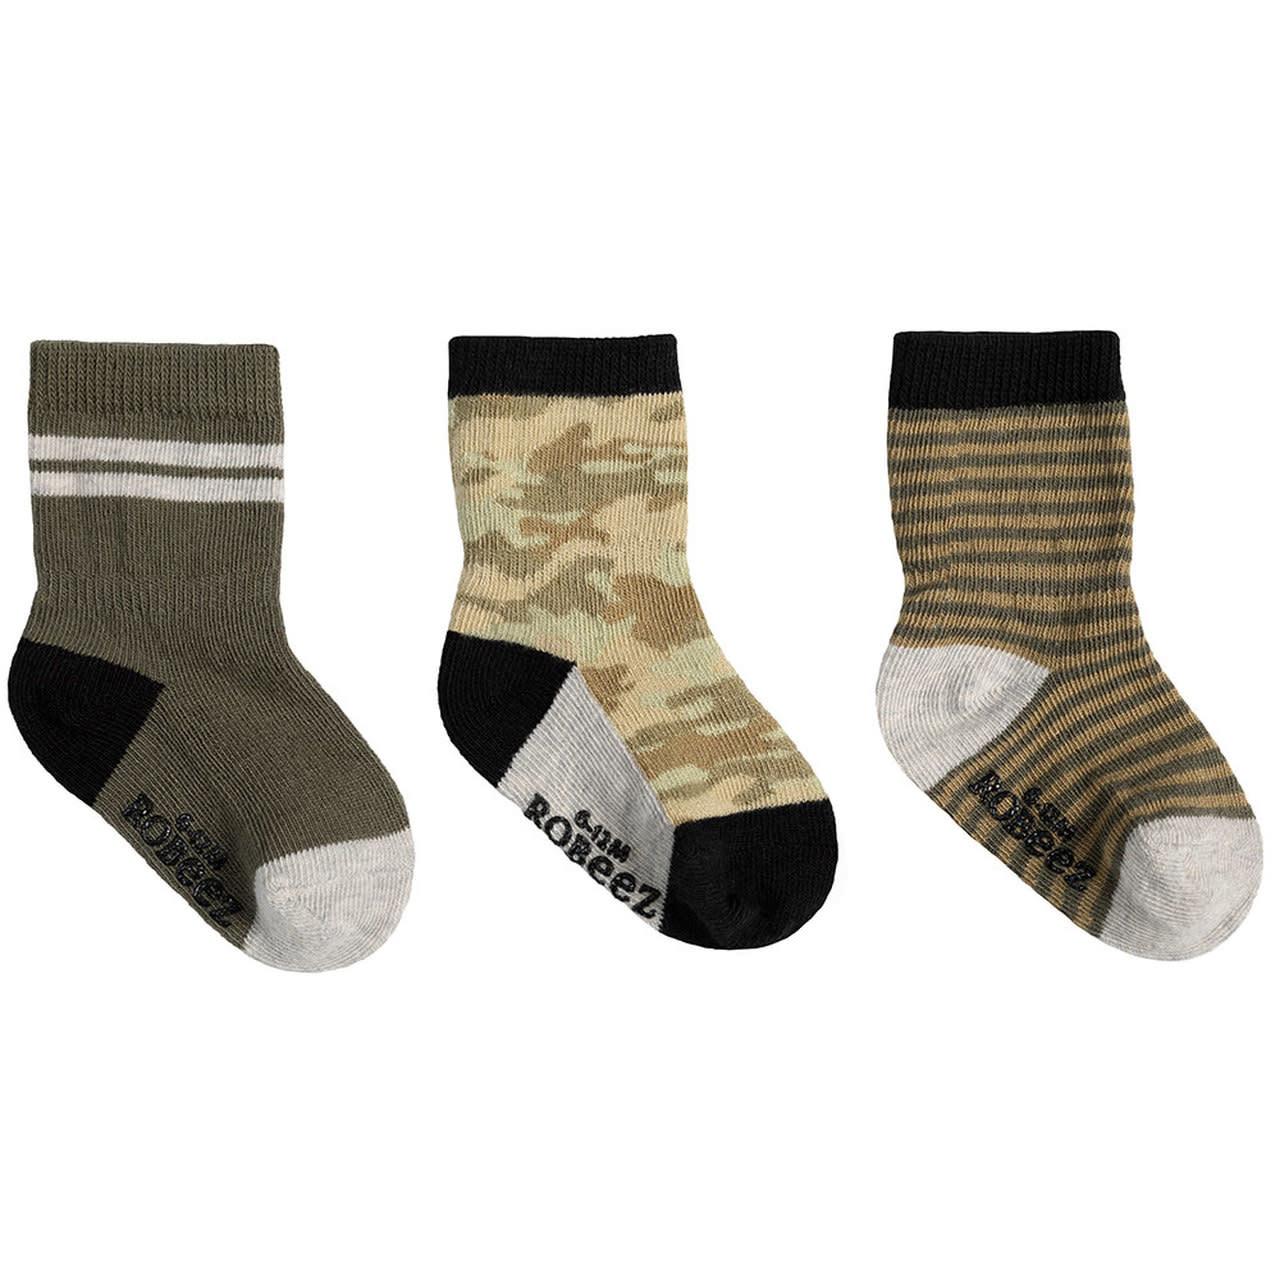 Robeez 3 Pk Socks, Jude Camo